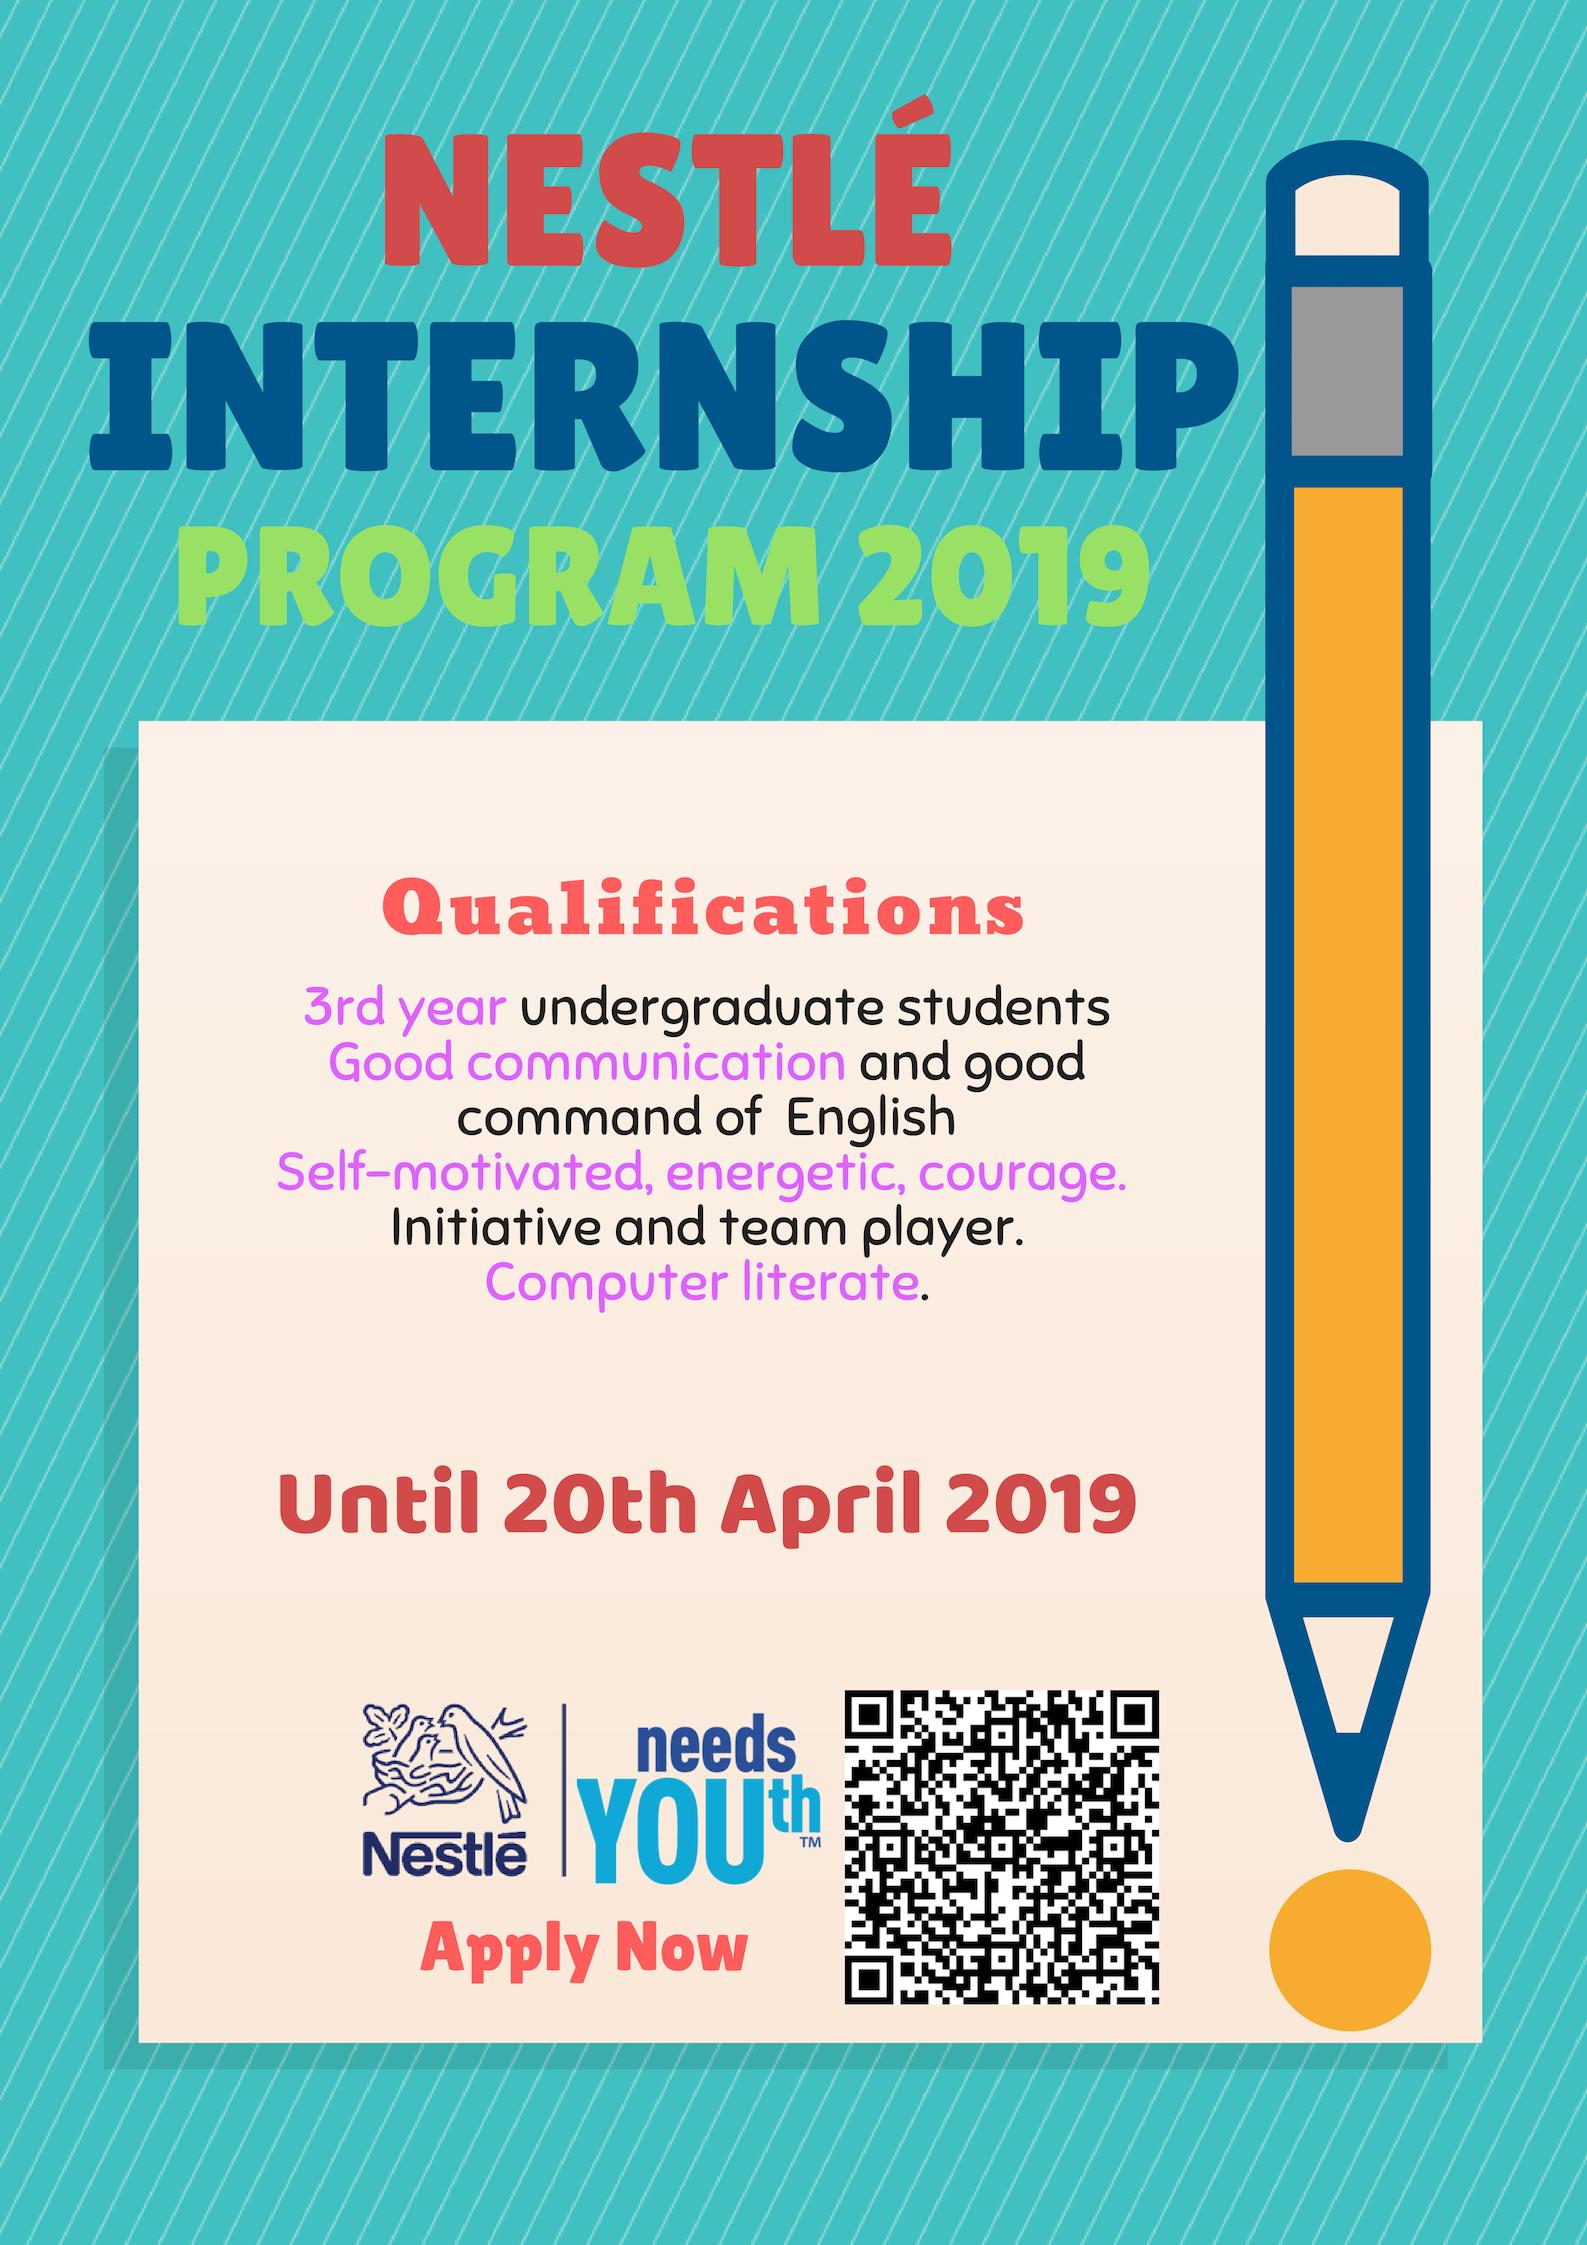 Nestlé Thailand | Student Internship Program